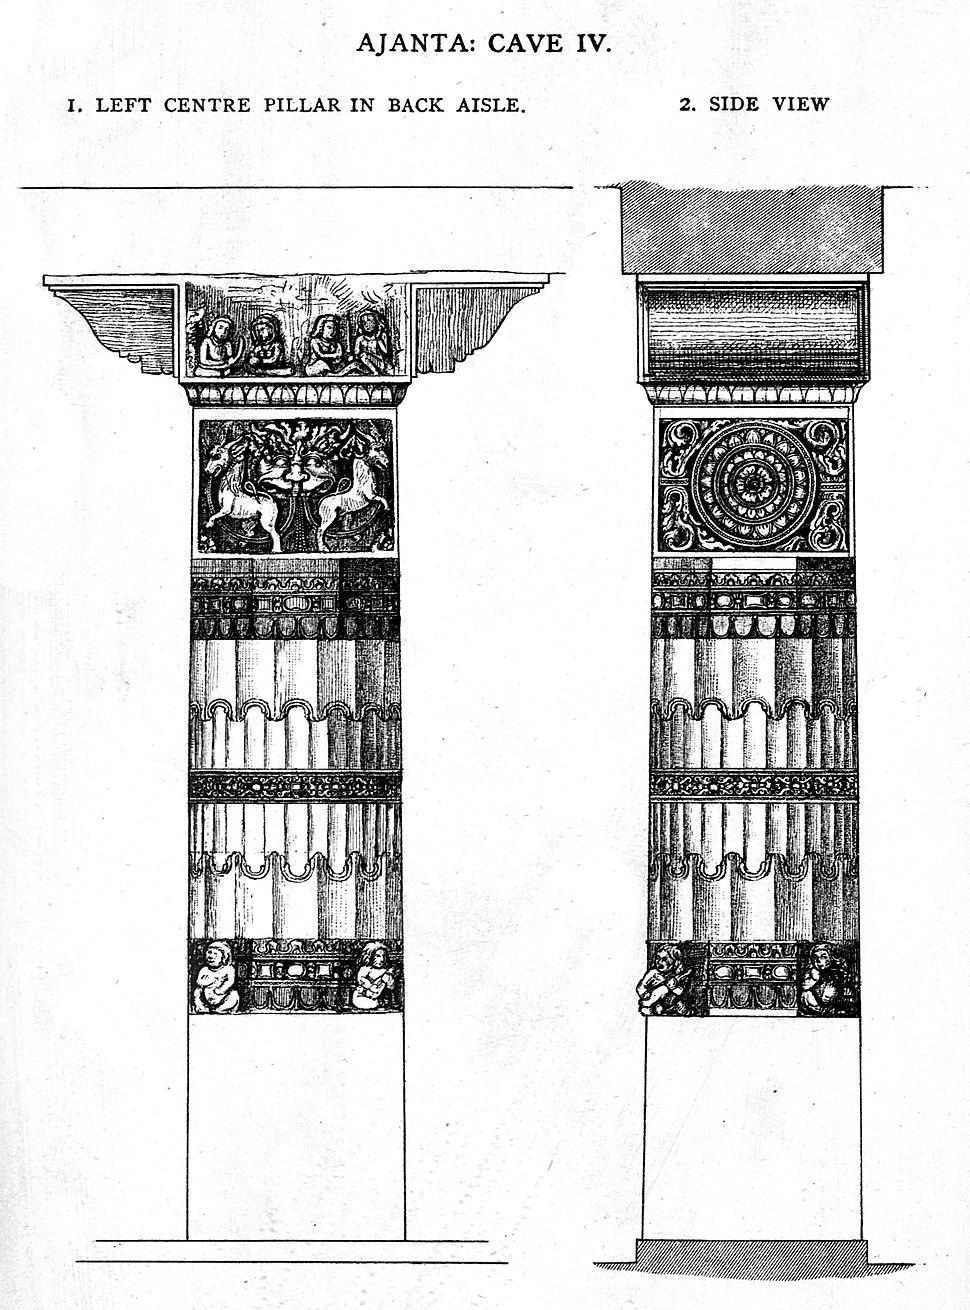 Ajanta Cave 4, Decorated back pillars